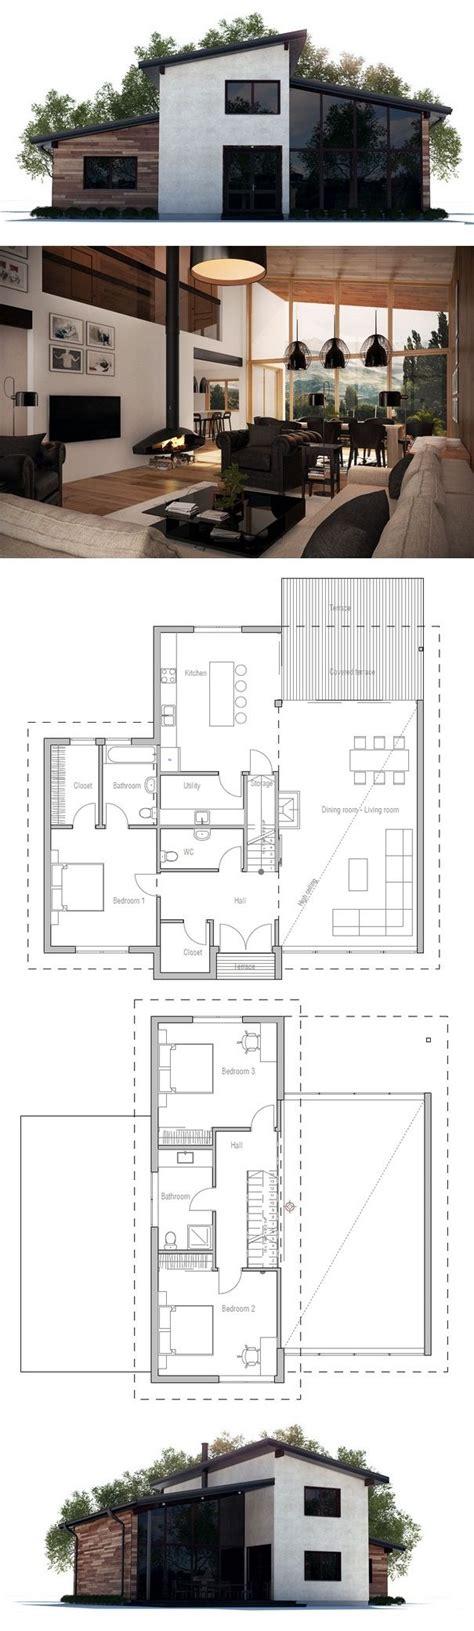 best 25 modern house design ideas on pinterest modern house plan best 25 modern house plans ideas on pinterest